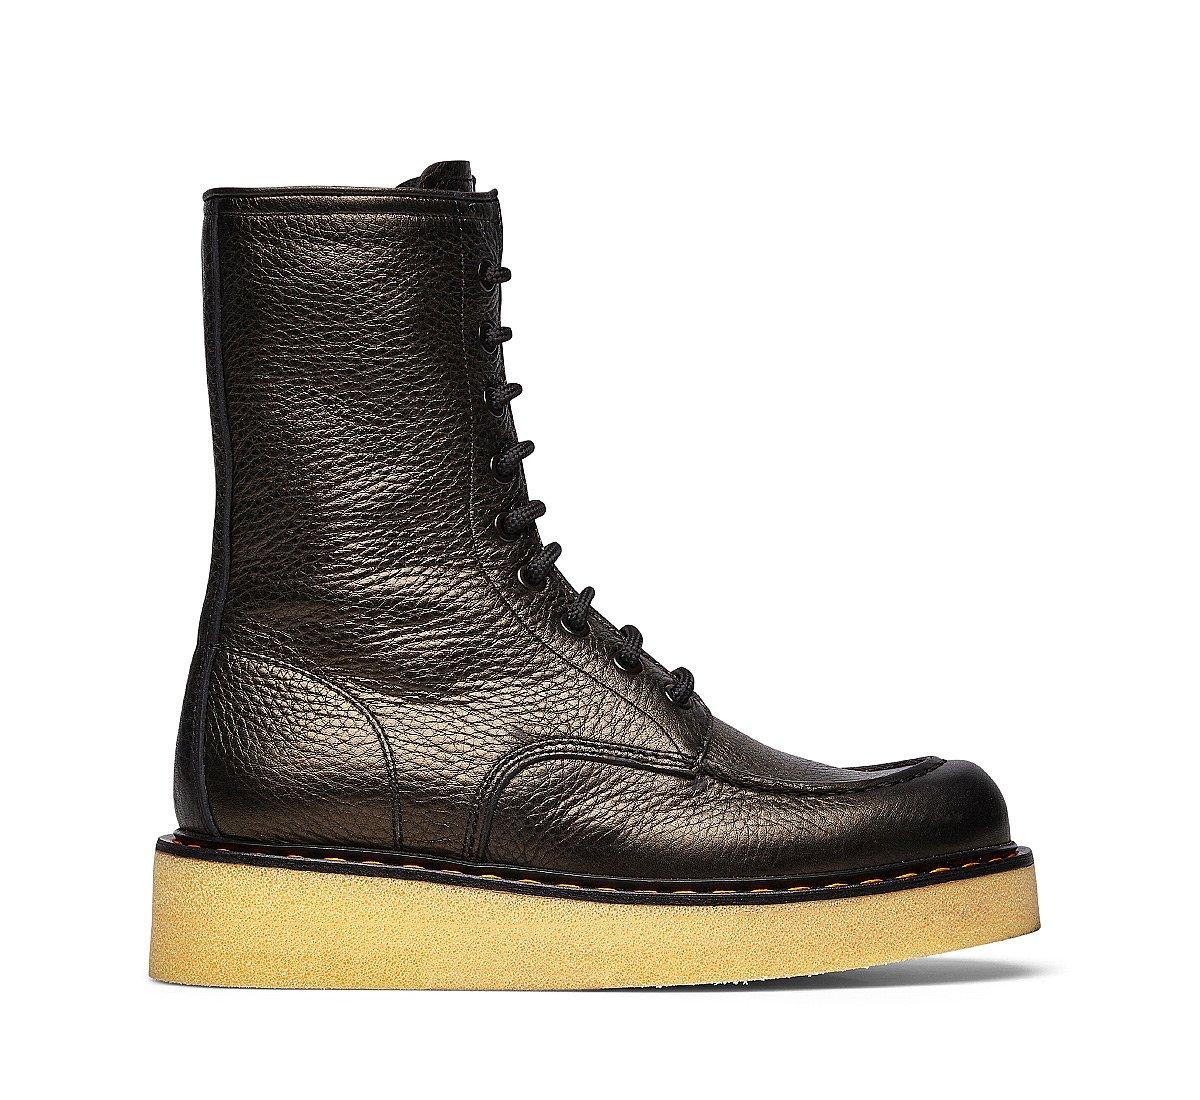 Barracuda calfskin ankle boots